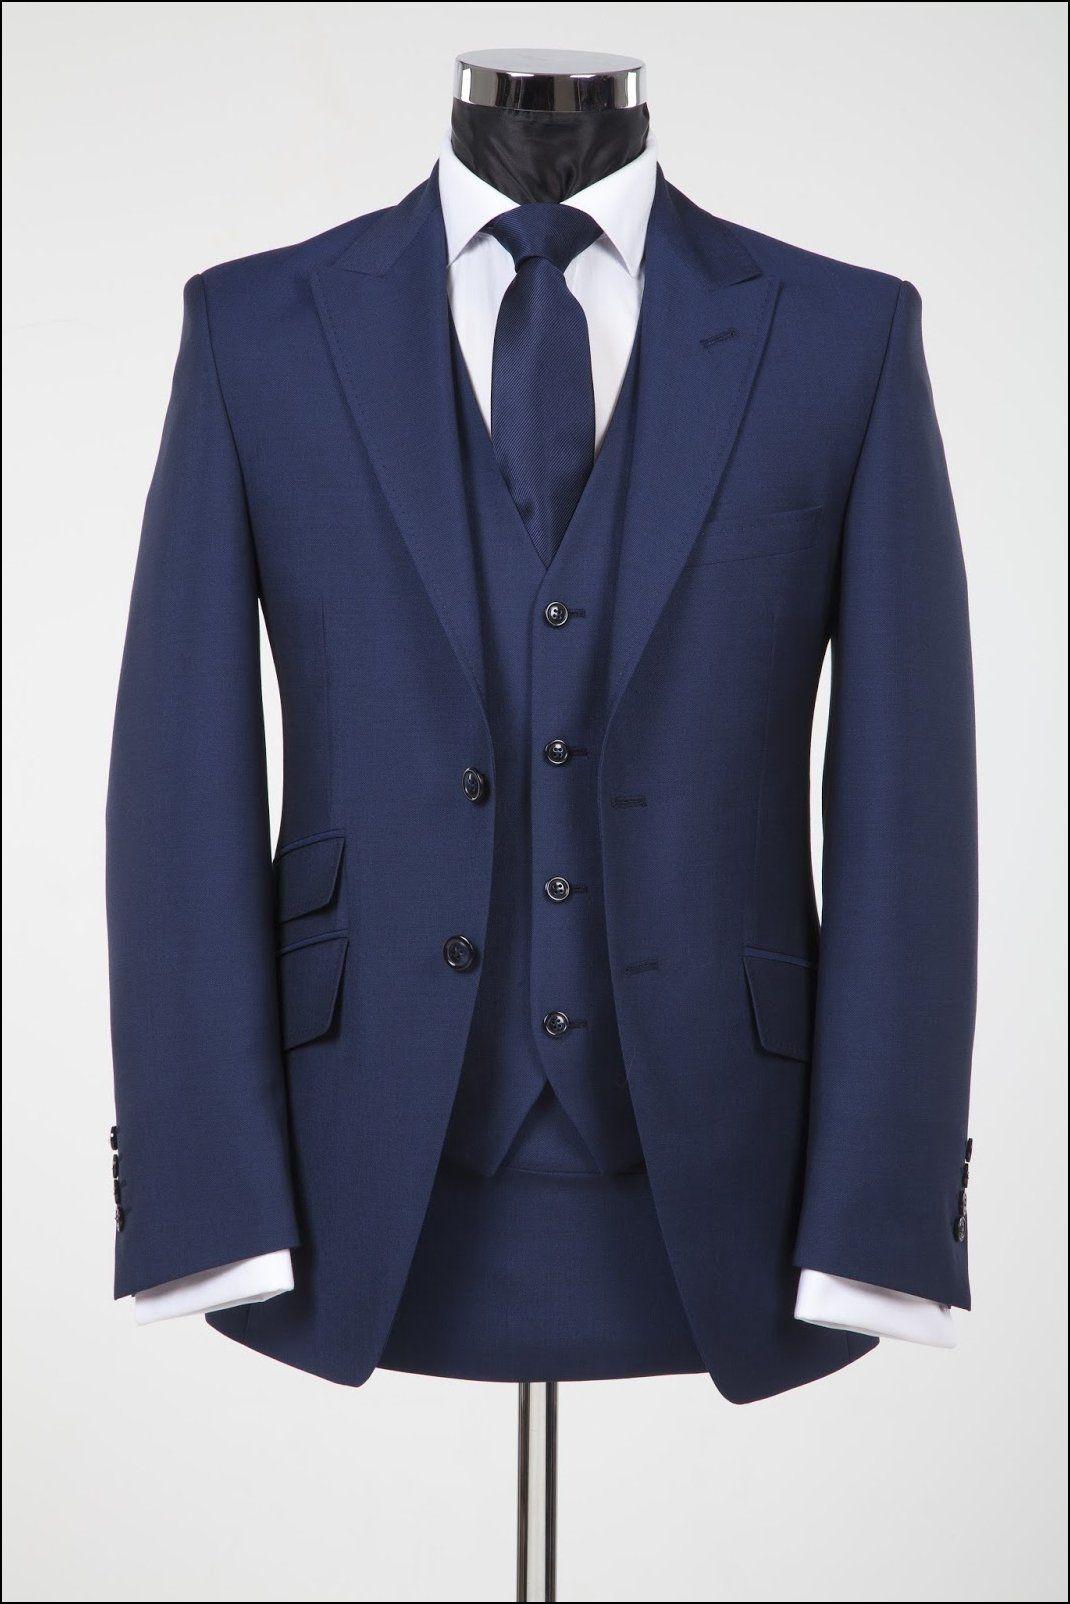 Mens Wedding Suits 36473 Vintage Wedding Suits Wedding Suits Groom Tuxedo Navy